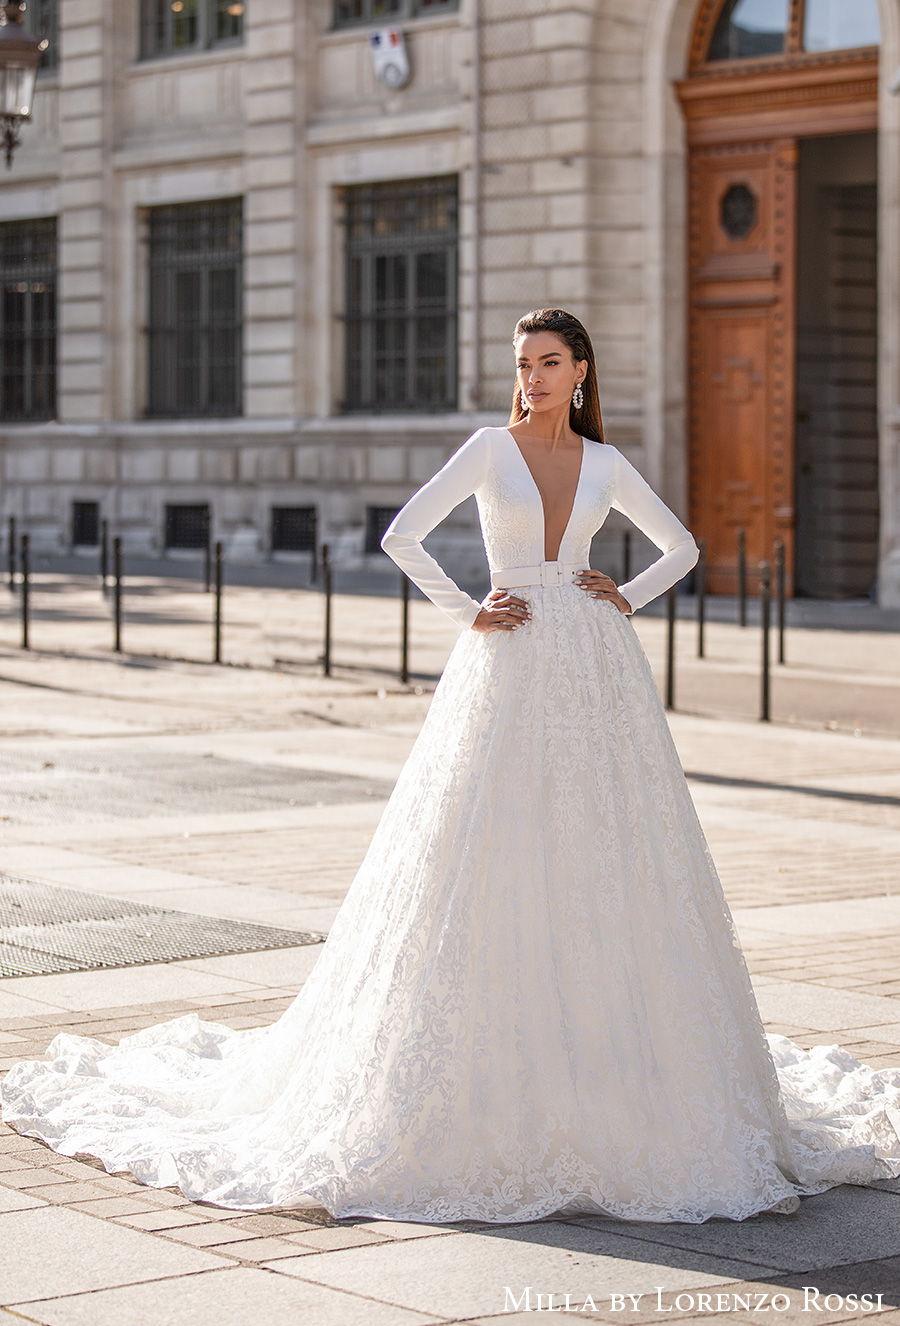 milla lorenzo rossi 2021 bridal long sleeves deep plunging v neck simple modern chic sexy a line wedding dress chapel train (rosalyn) mv